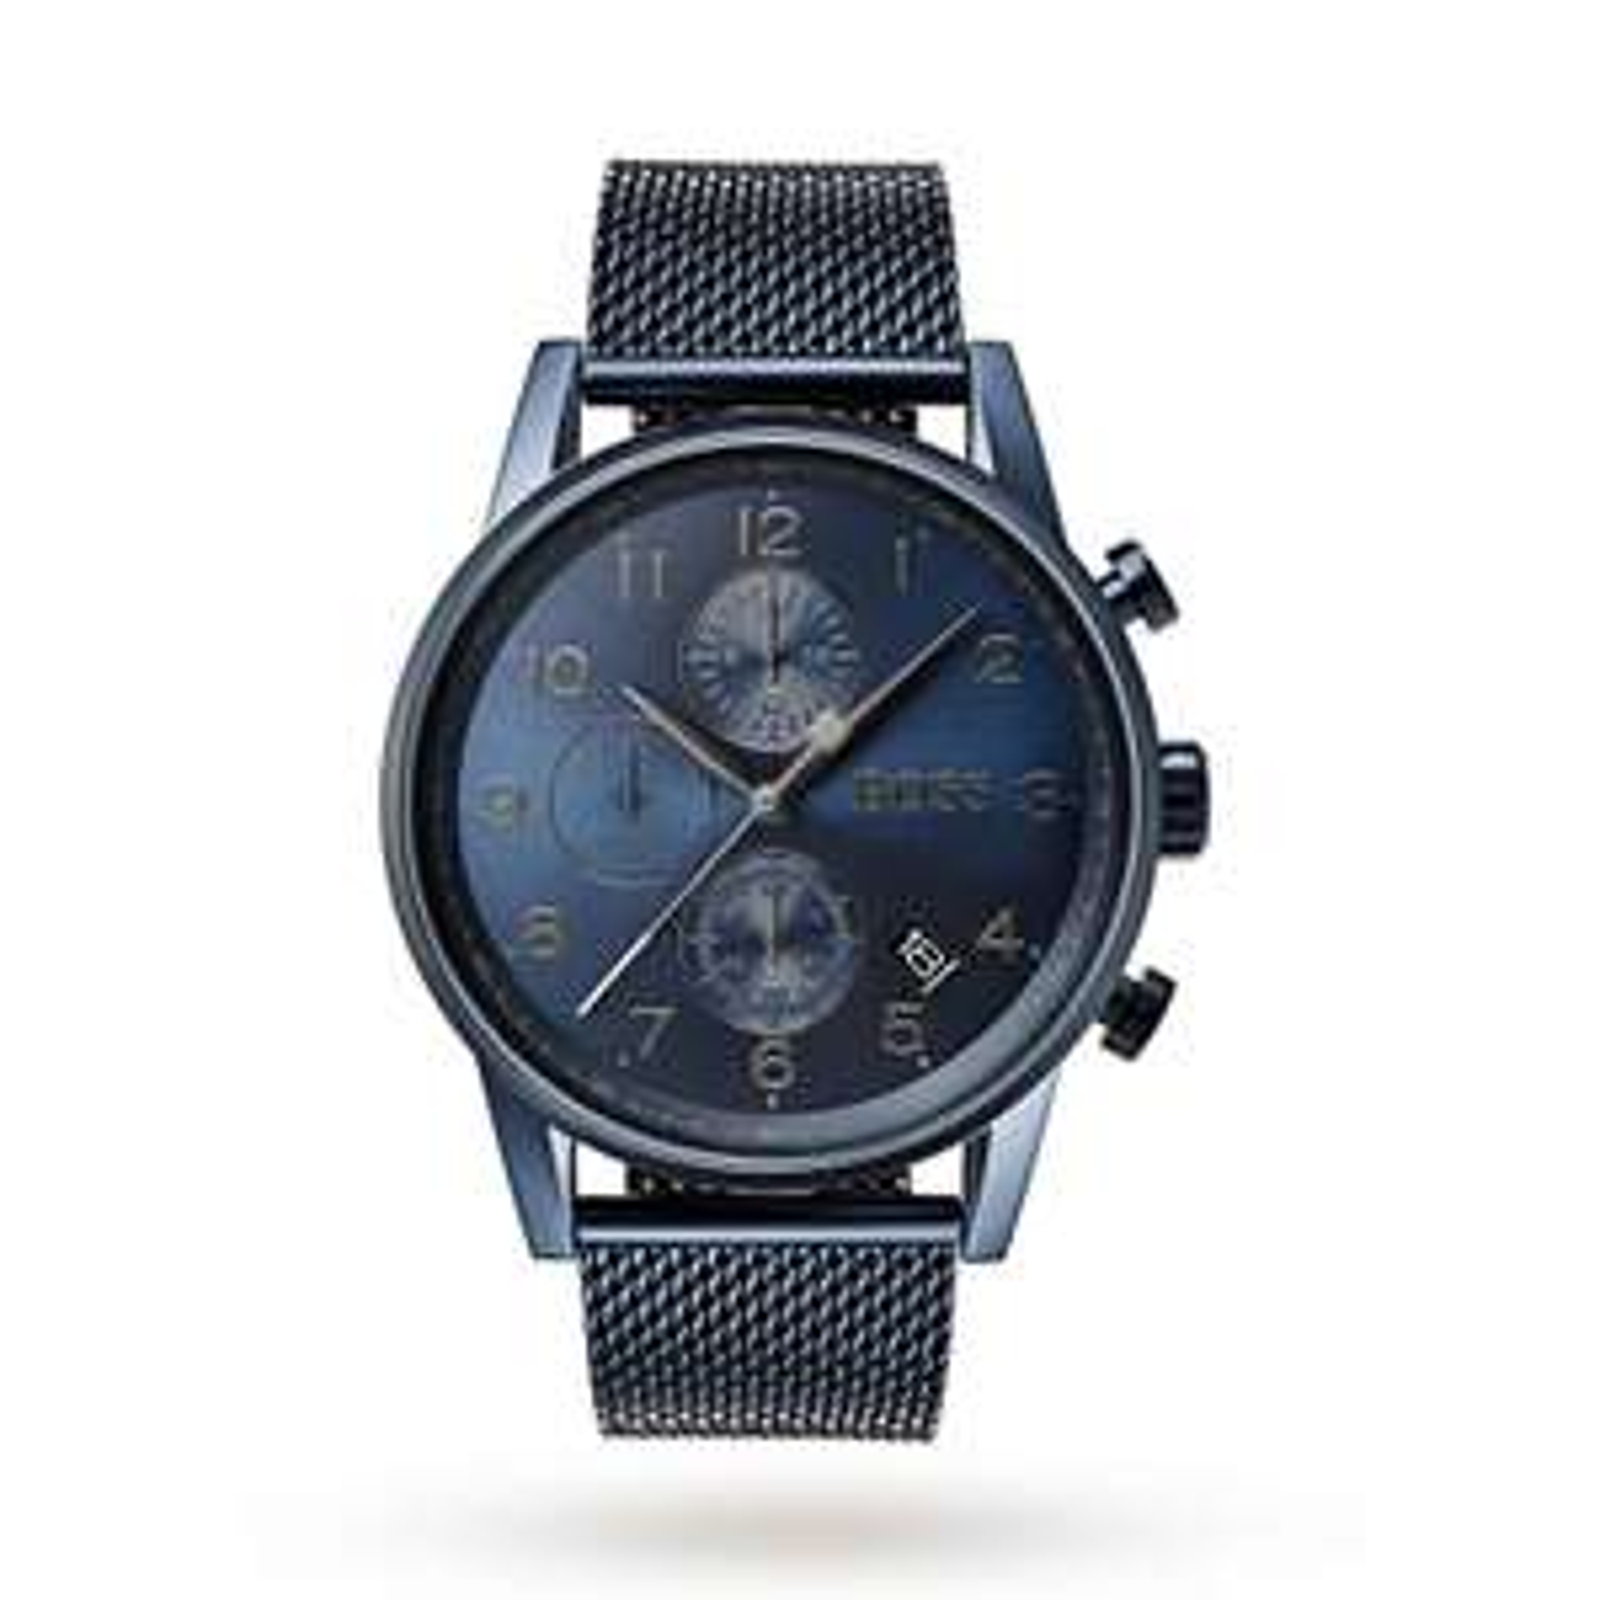 Hugo Boss GQ Edition Navigator Blue Chronograph Mens Watch £199.00 @ Goldsmiths